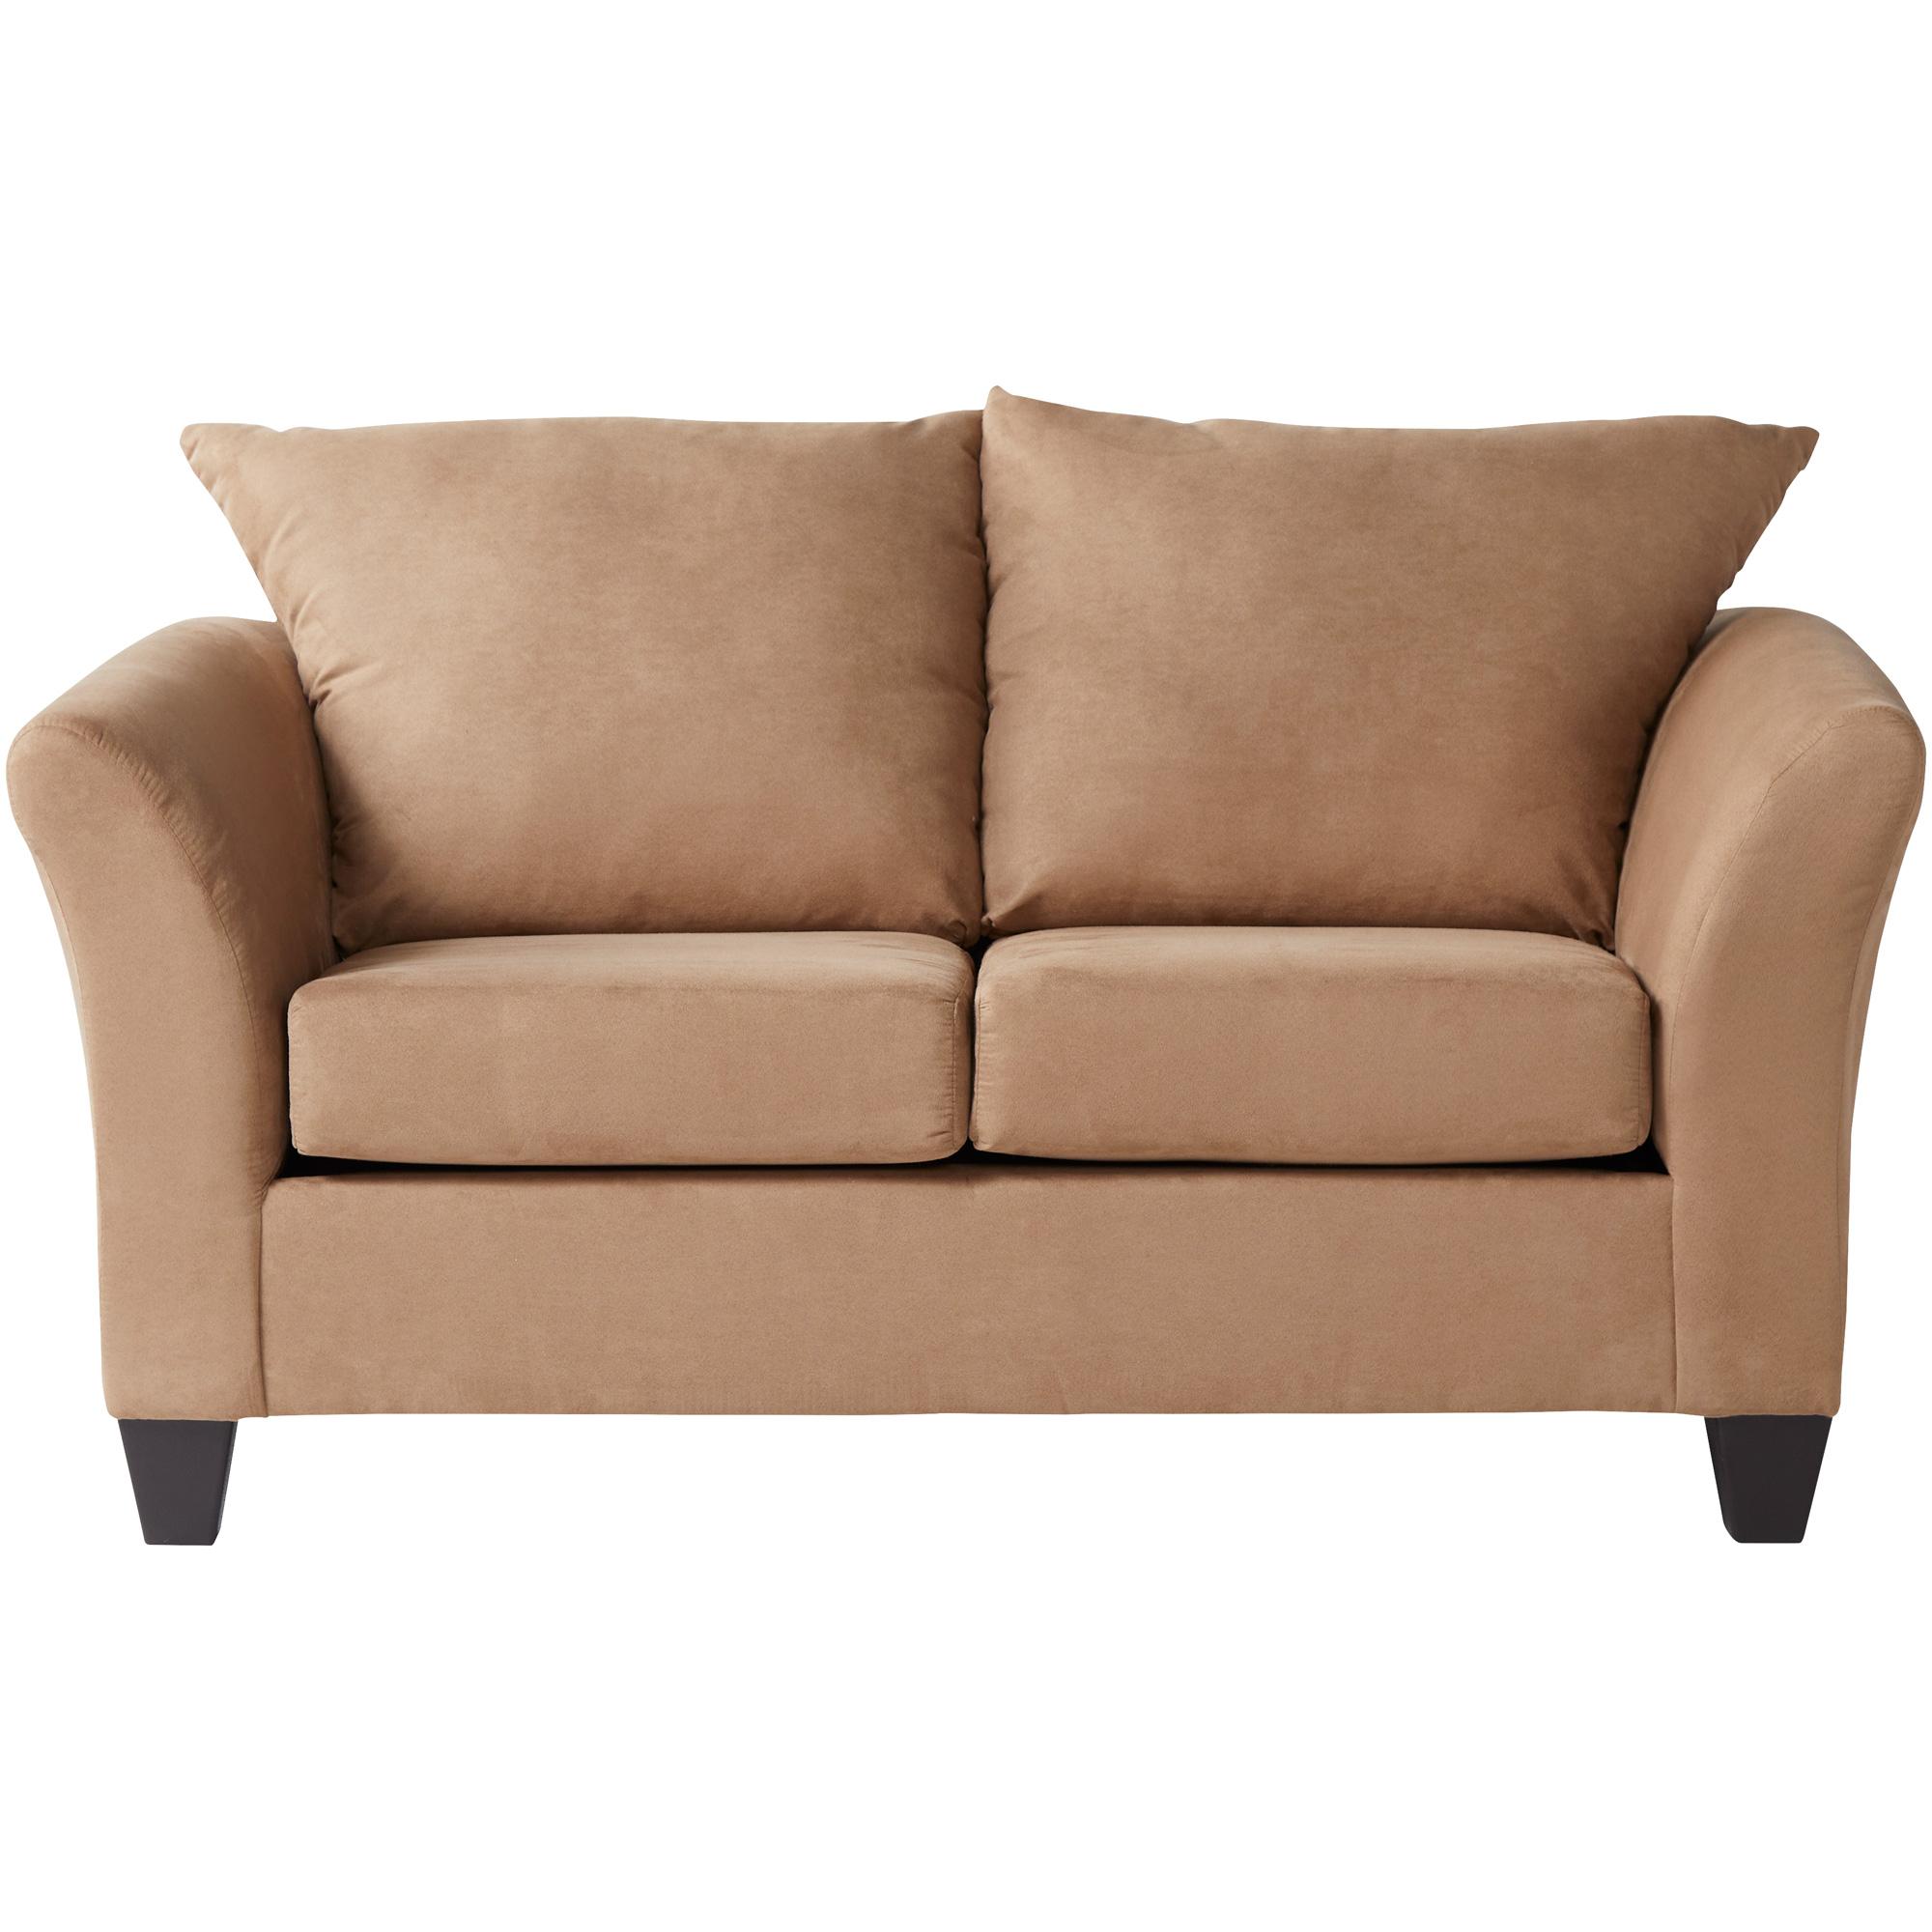 Serta Upholstery By Hughes Furniture | Buster Mocha Loveseat Sofa